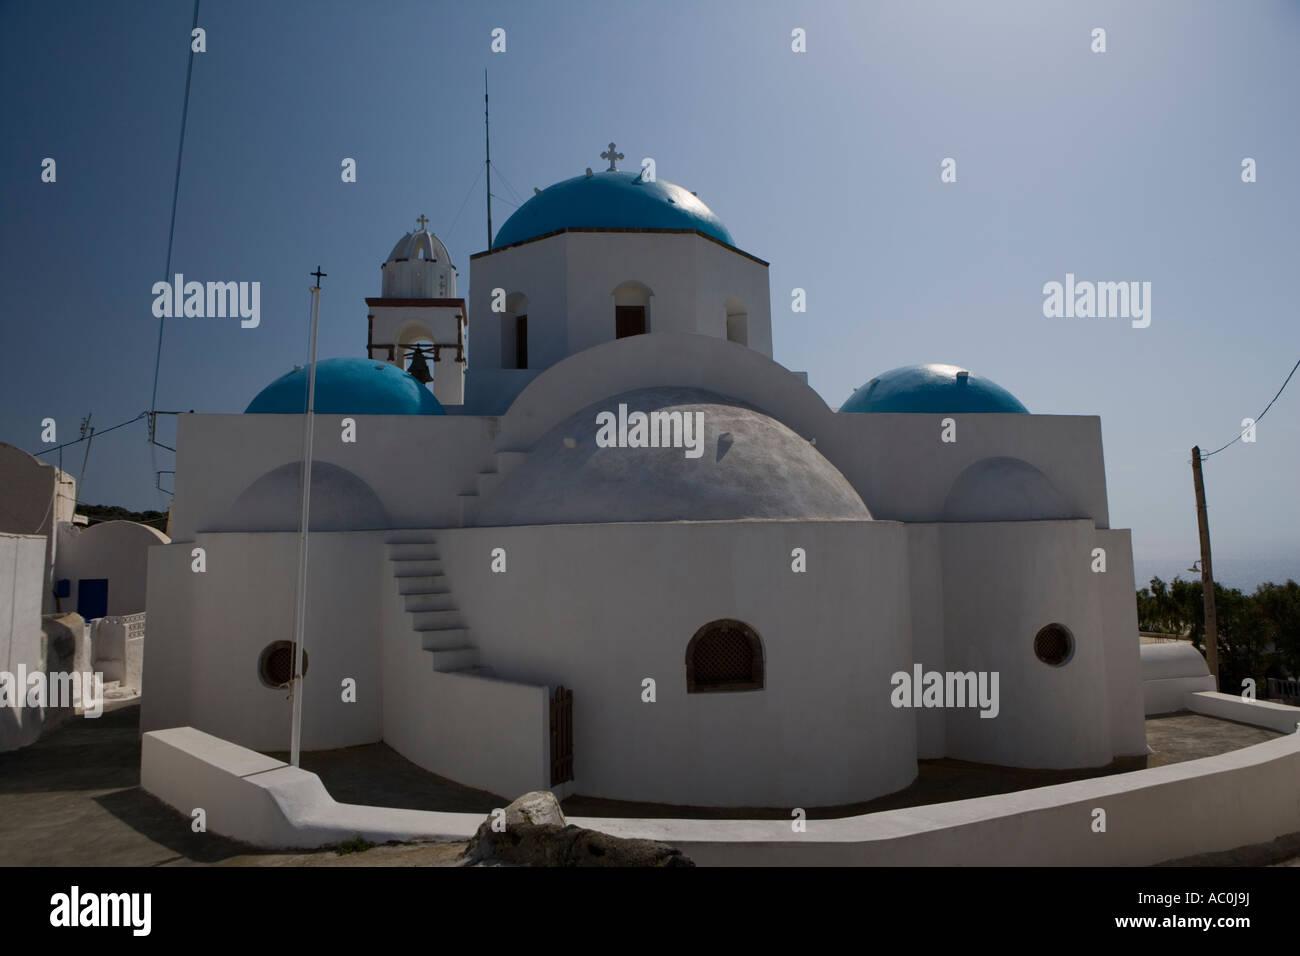 Rear view of Agios Konstantinos in Manolas,, Thirassia Santorini, Greece - Stock Image